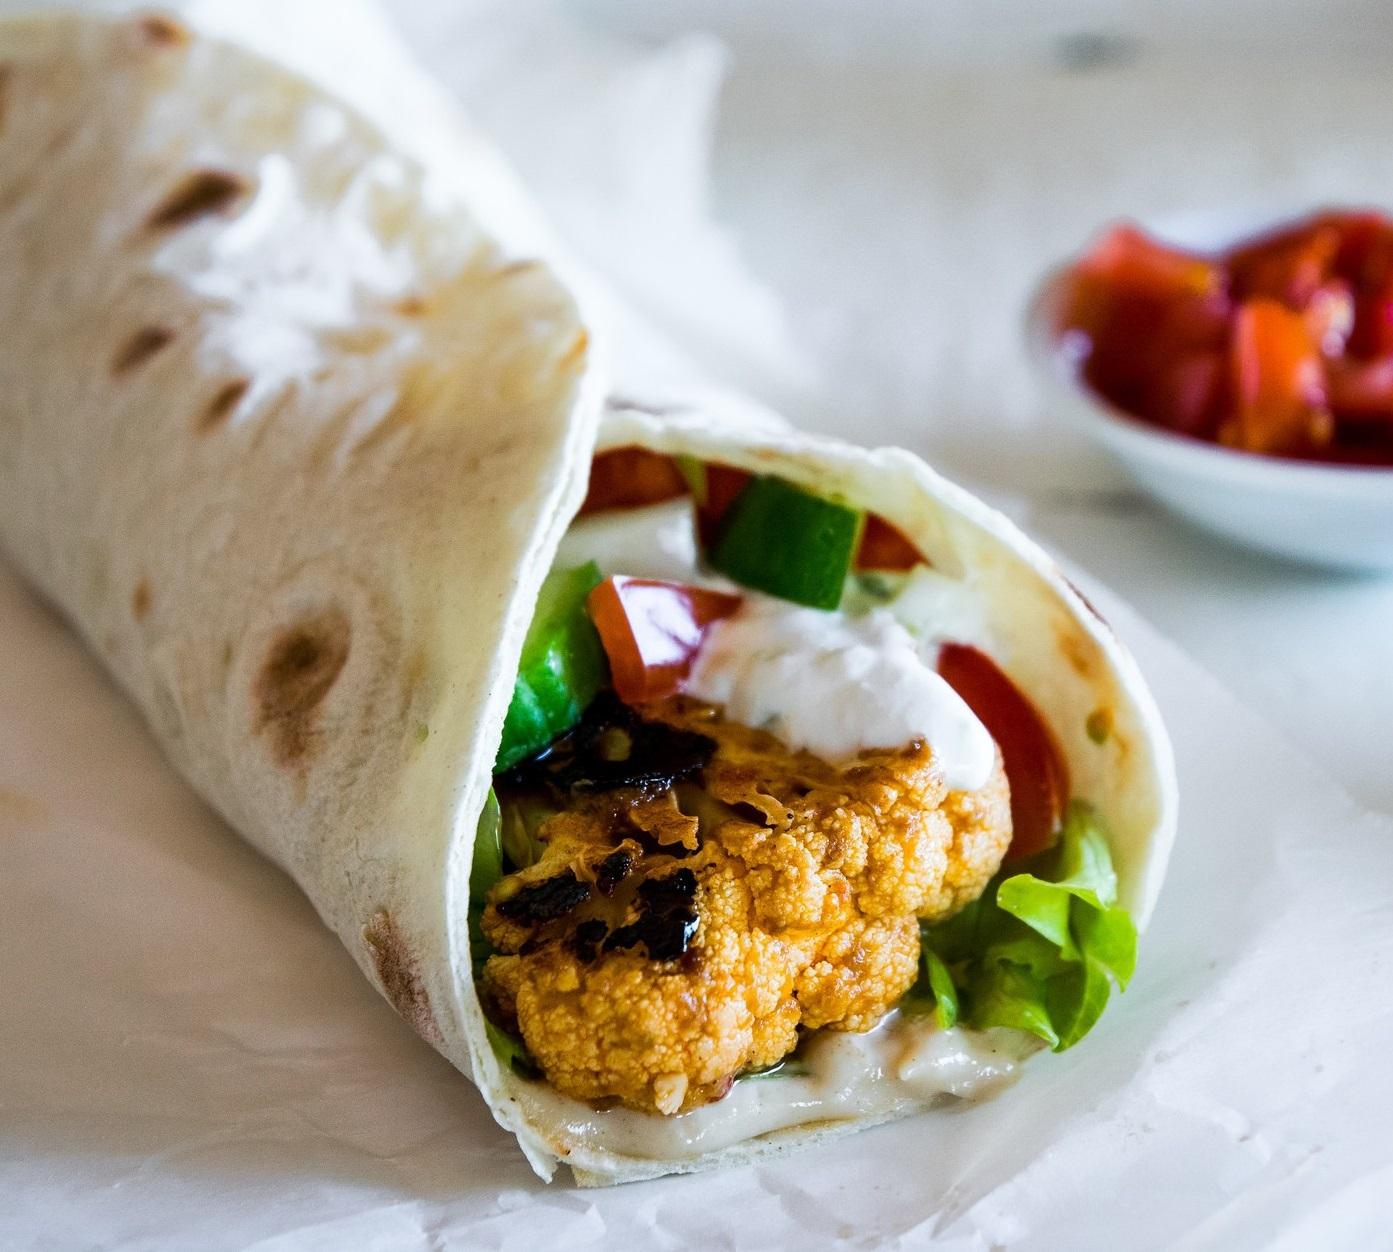 Шаурма – кулинарный рецепт